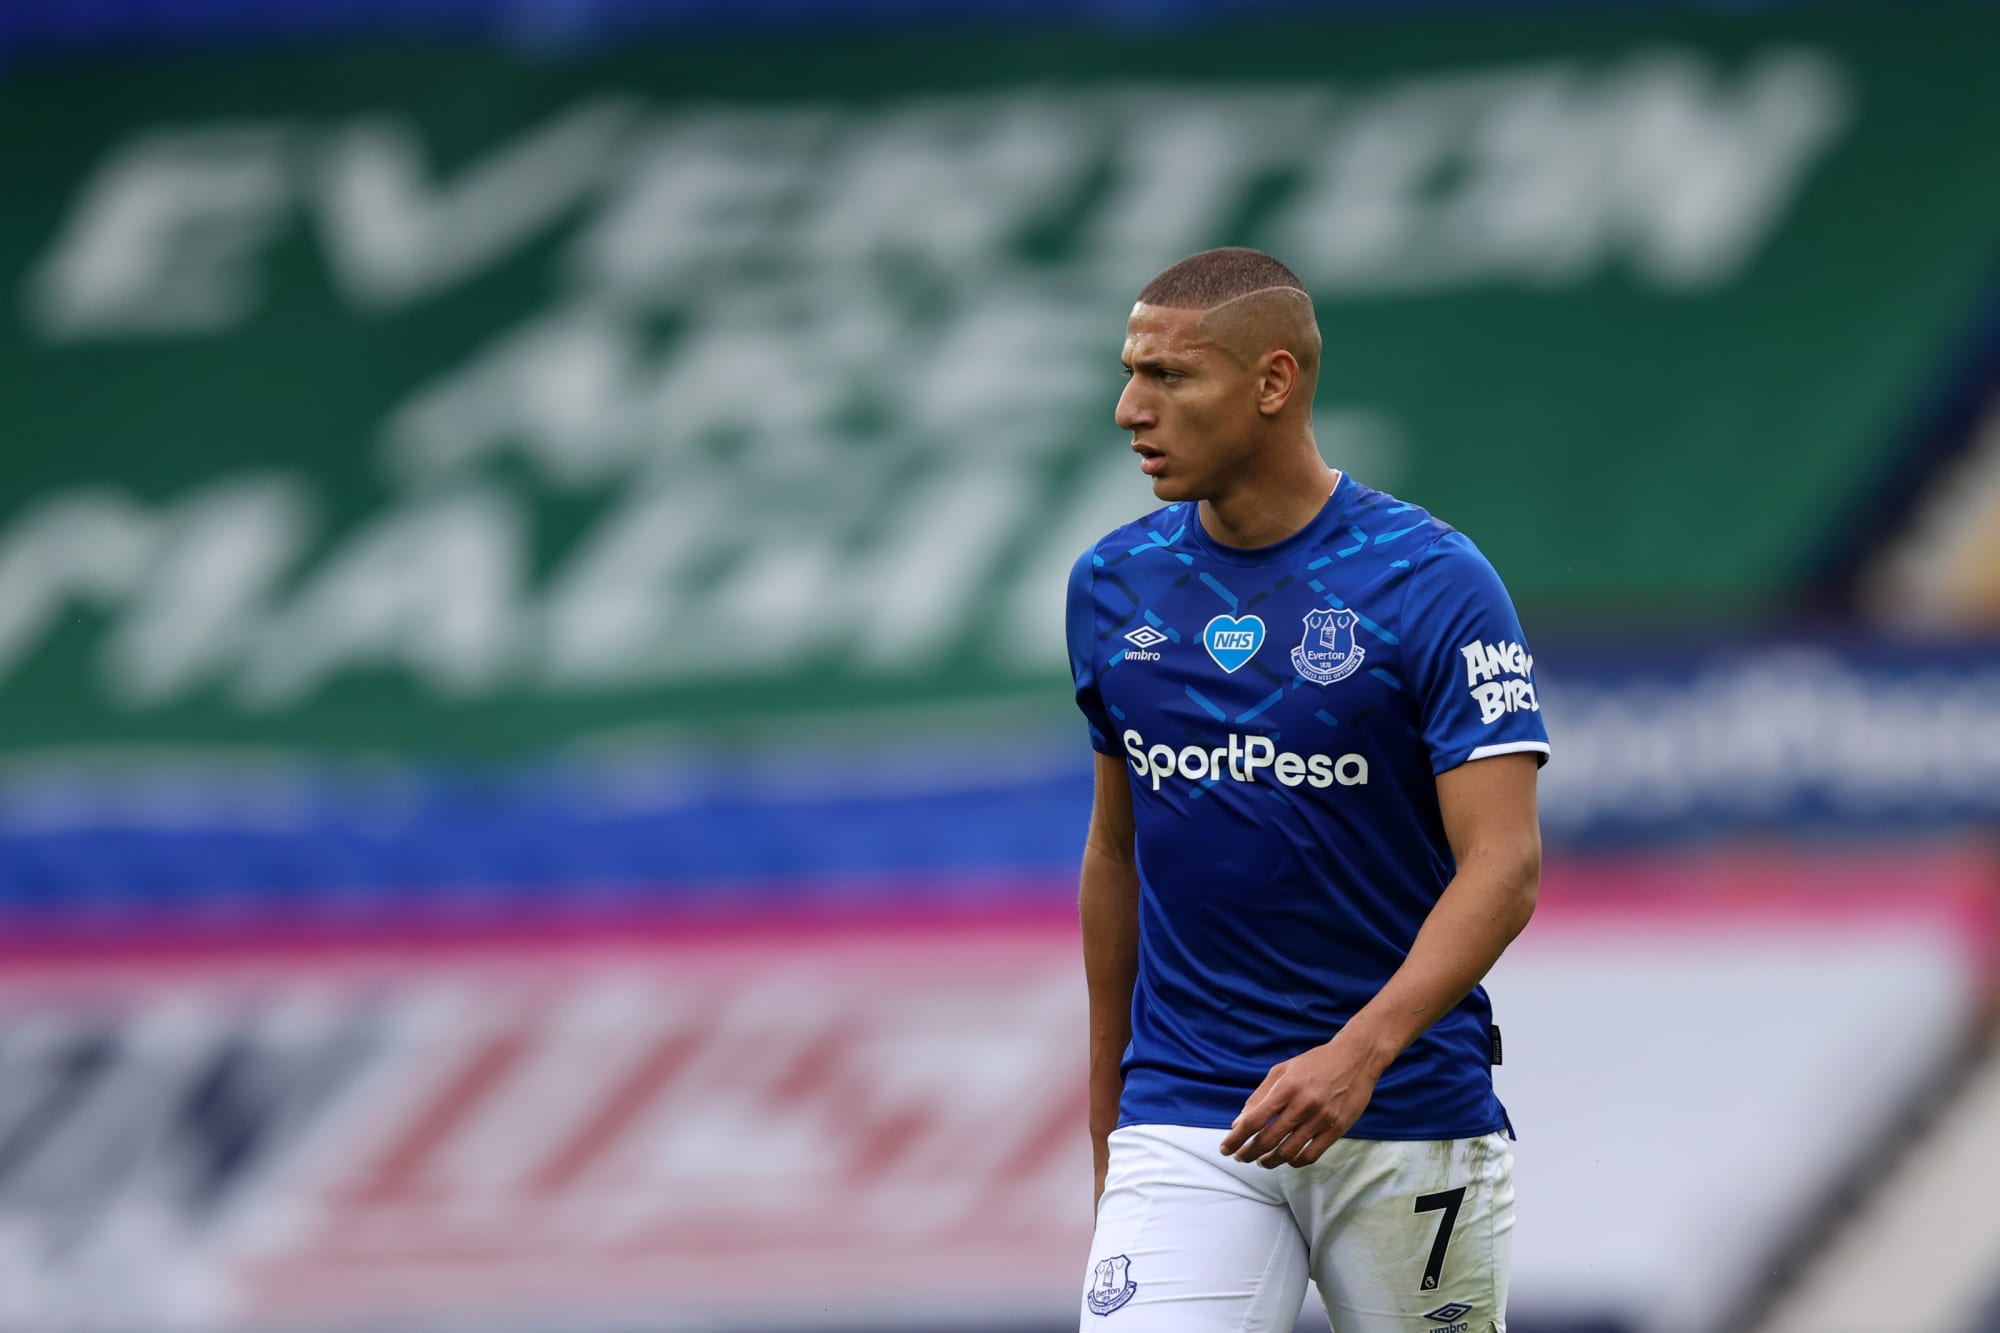 Everton 2019-20 season player review: forwards